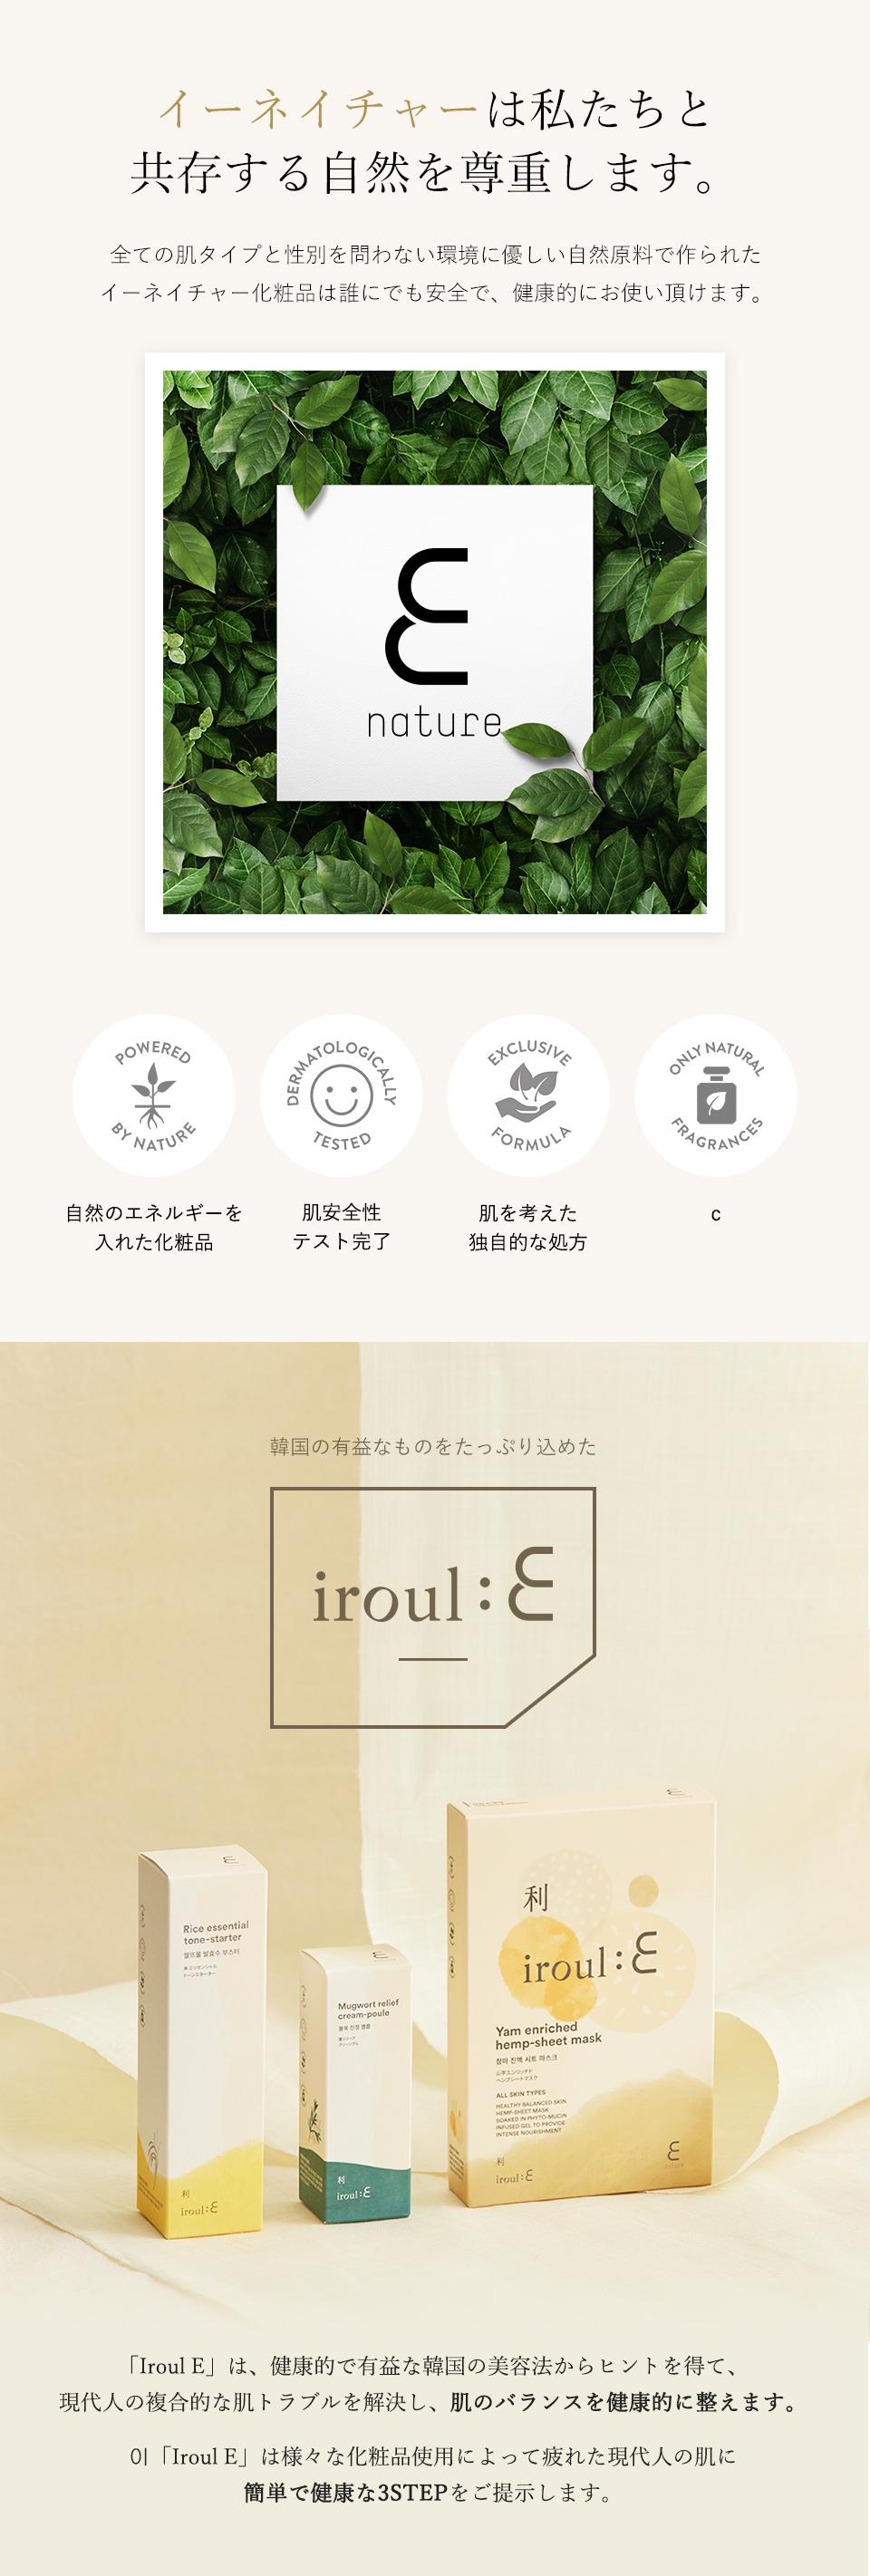 iroulE_creampoule_10_shop1_143543.jpg